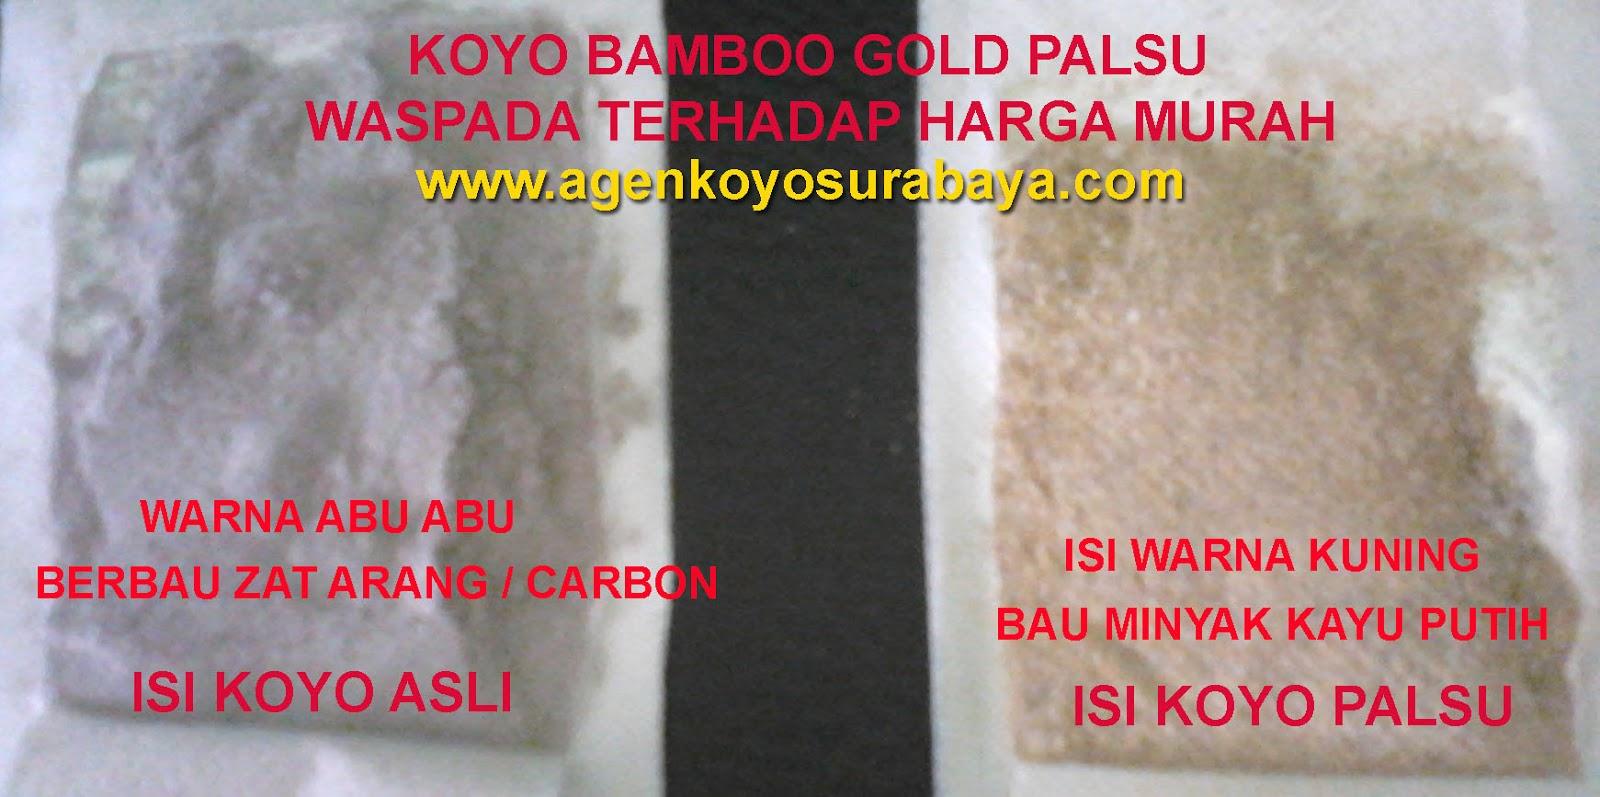 Daftar Harga Koyo Kaki Bamboo Bambu Gold Original Terbaru 2018 Detox Agen Surabaya Happy Life Jual Ciri Yang Tidak Ori Kw